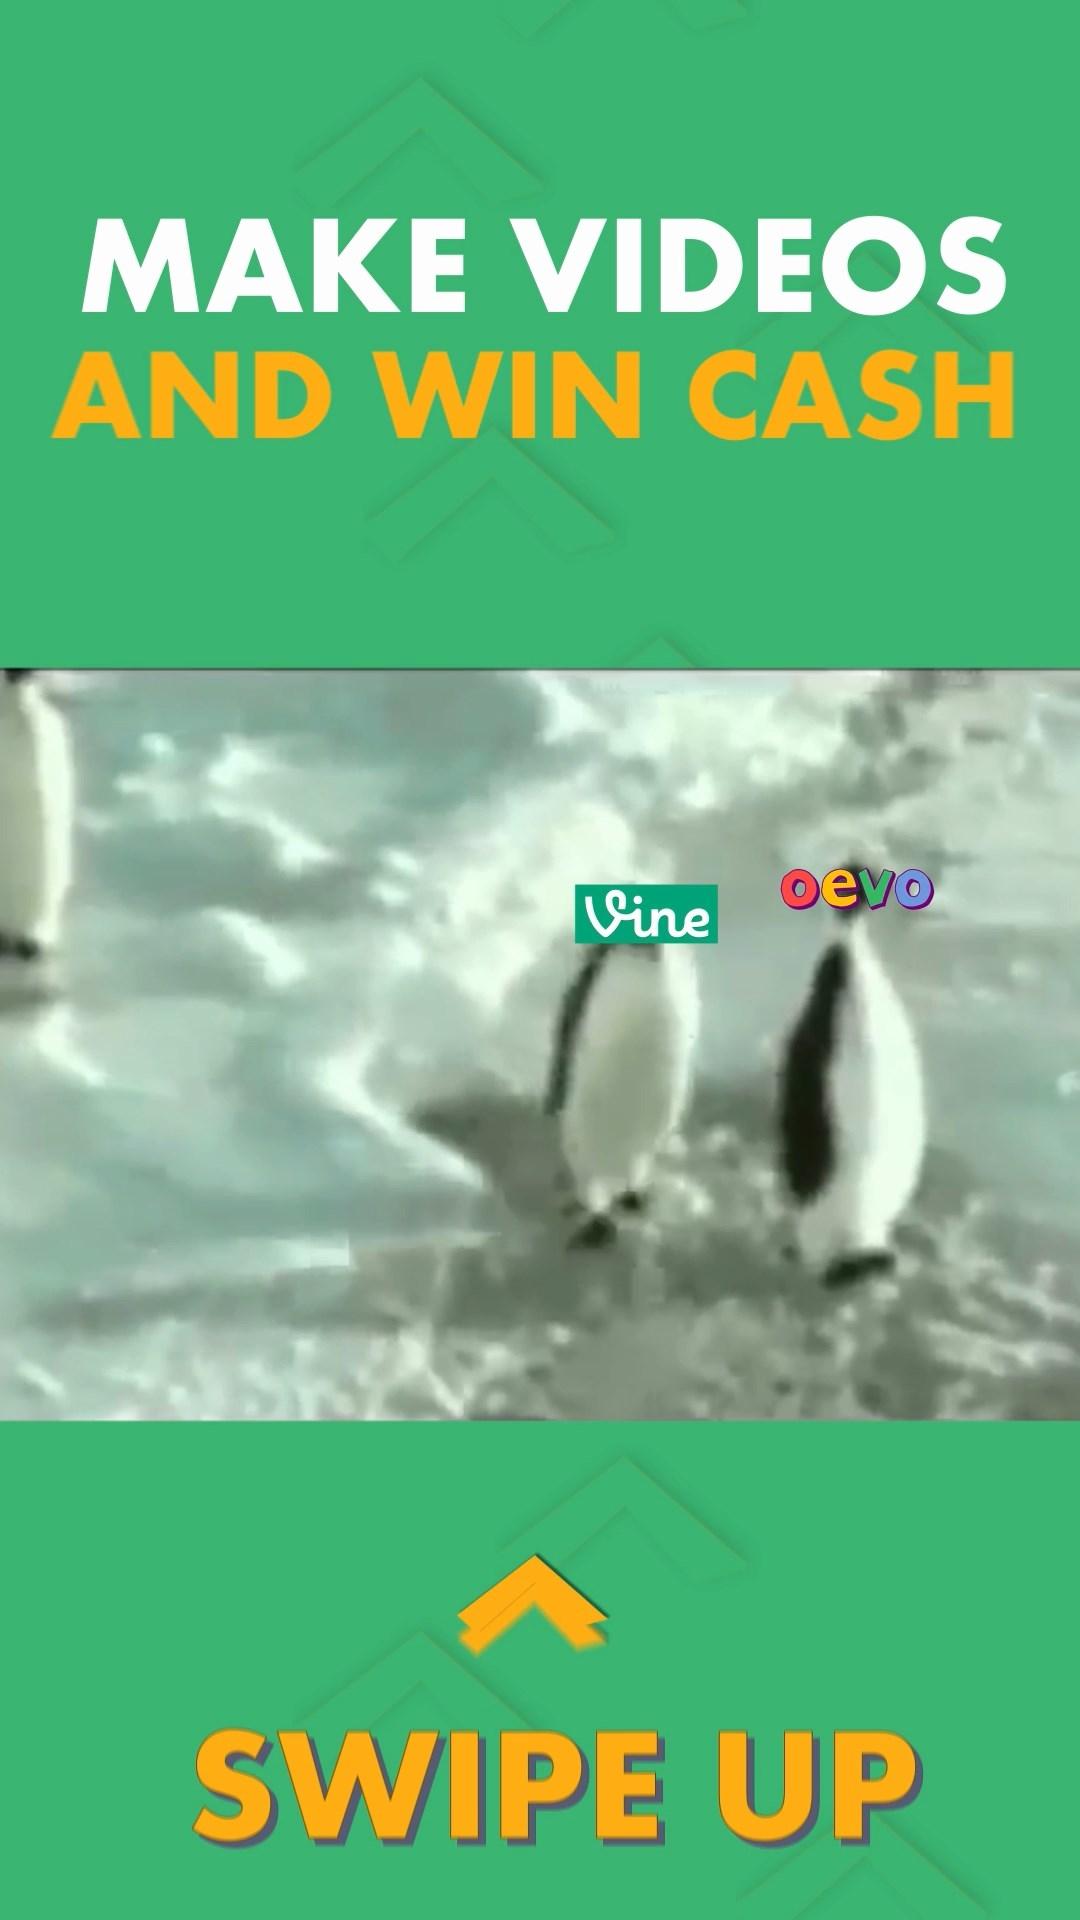 Extra image